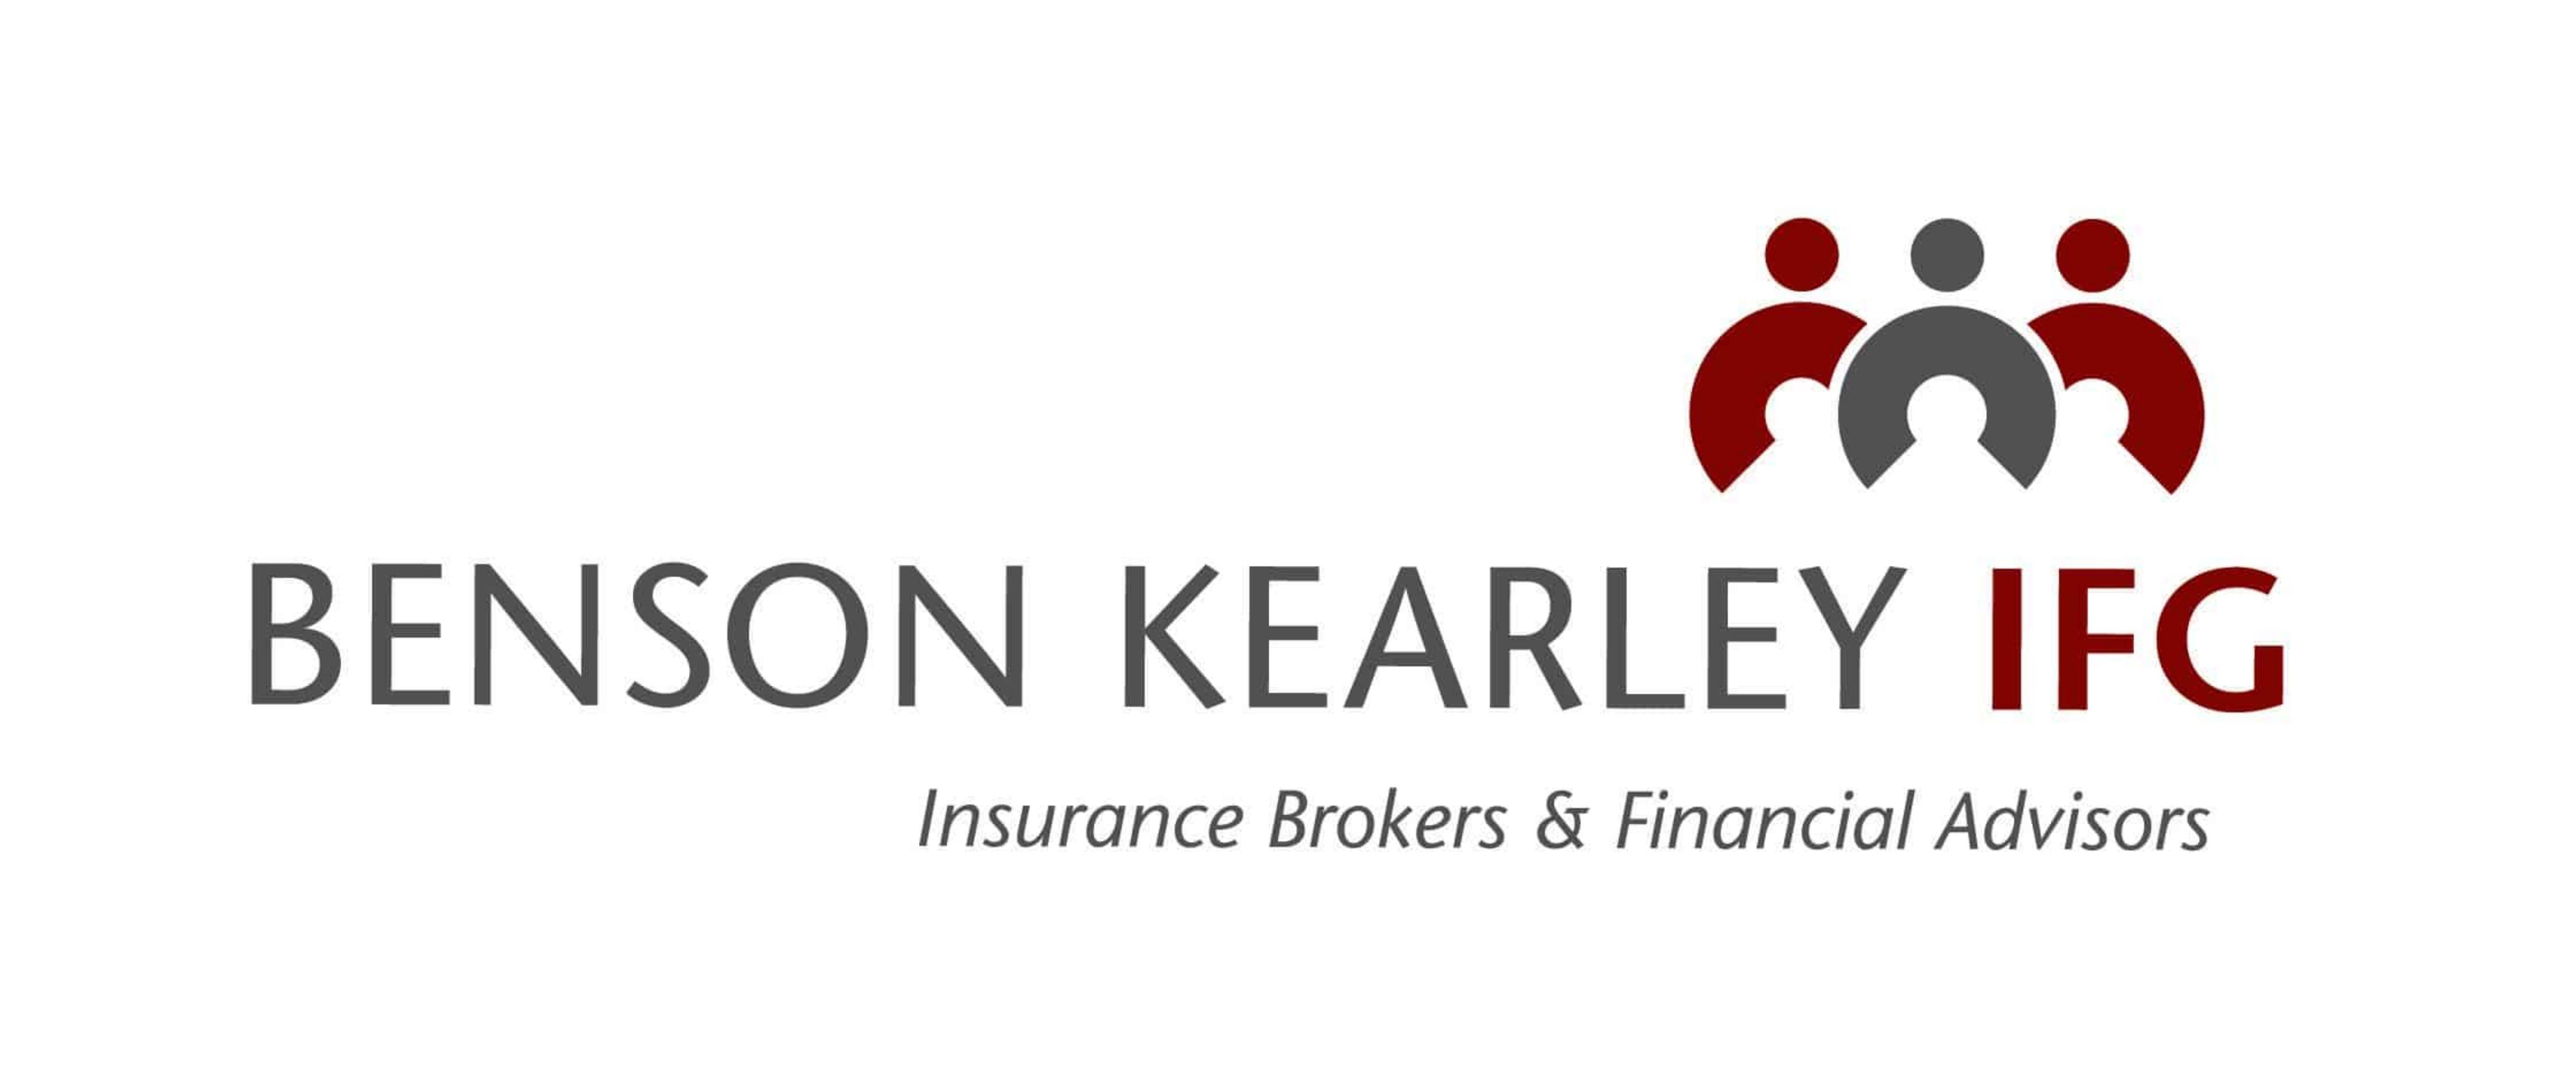 Benson & Kearley IFG logo